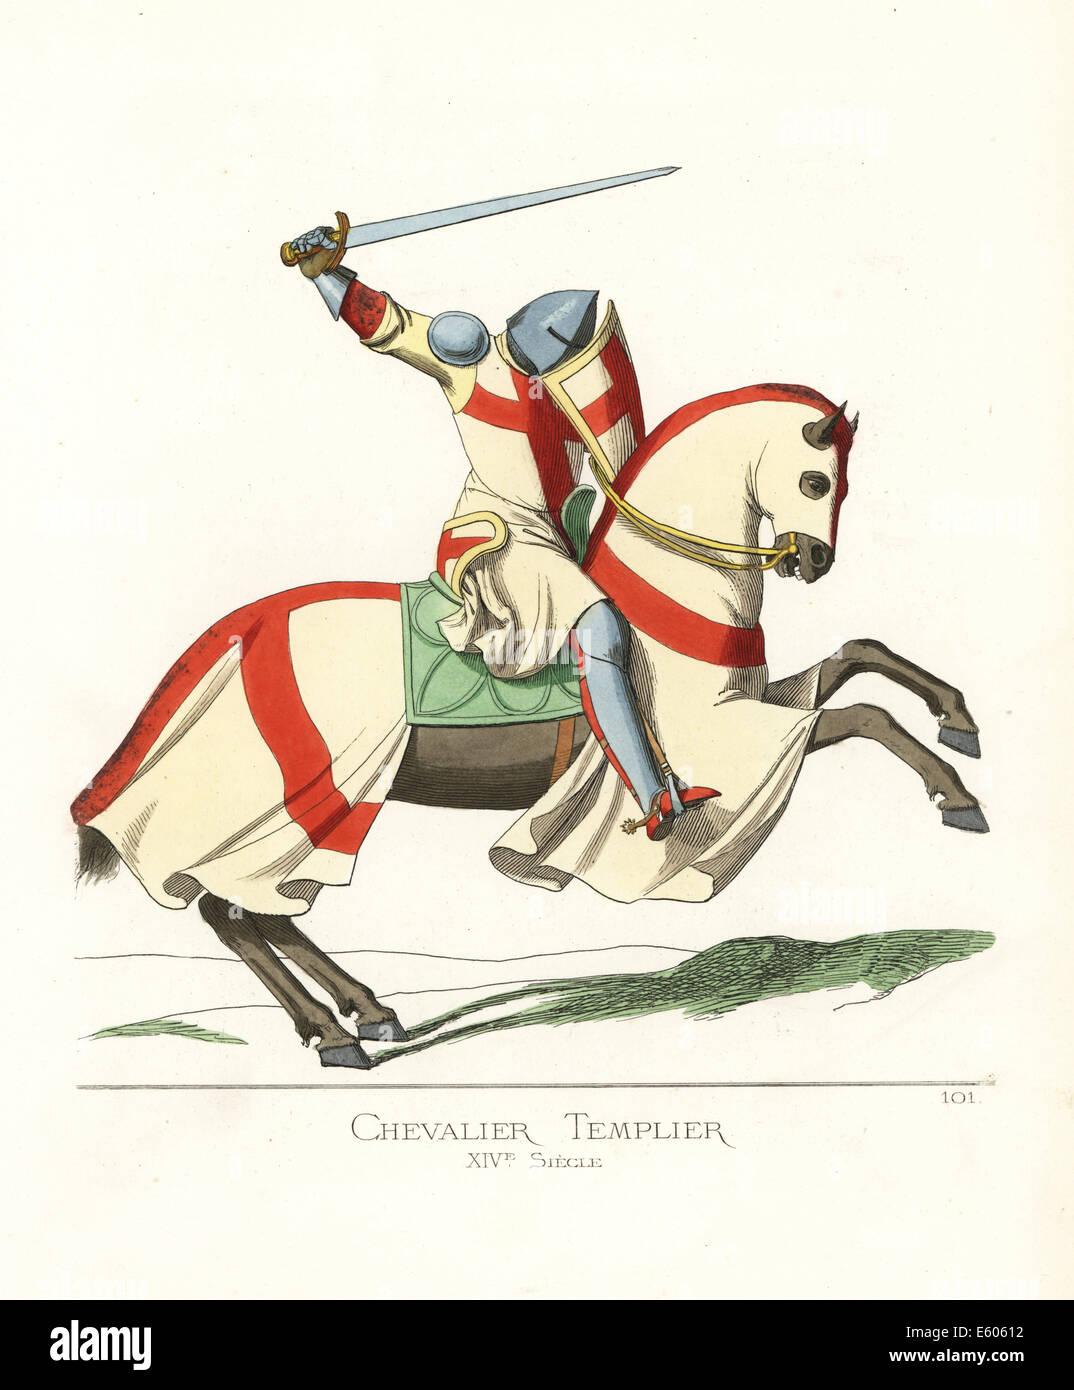 A knight Templar on horseback, 14th century. - Stock Image